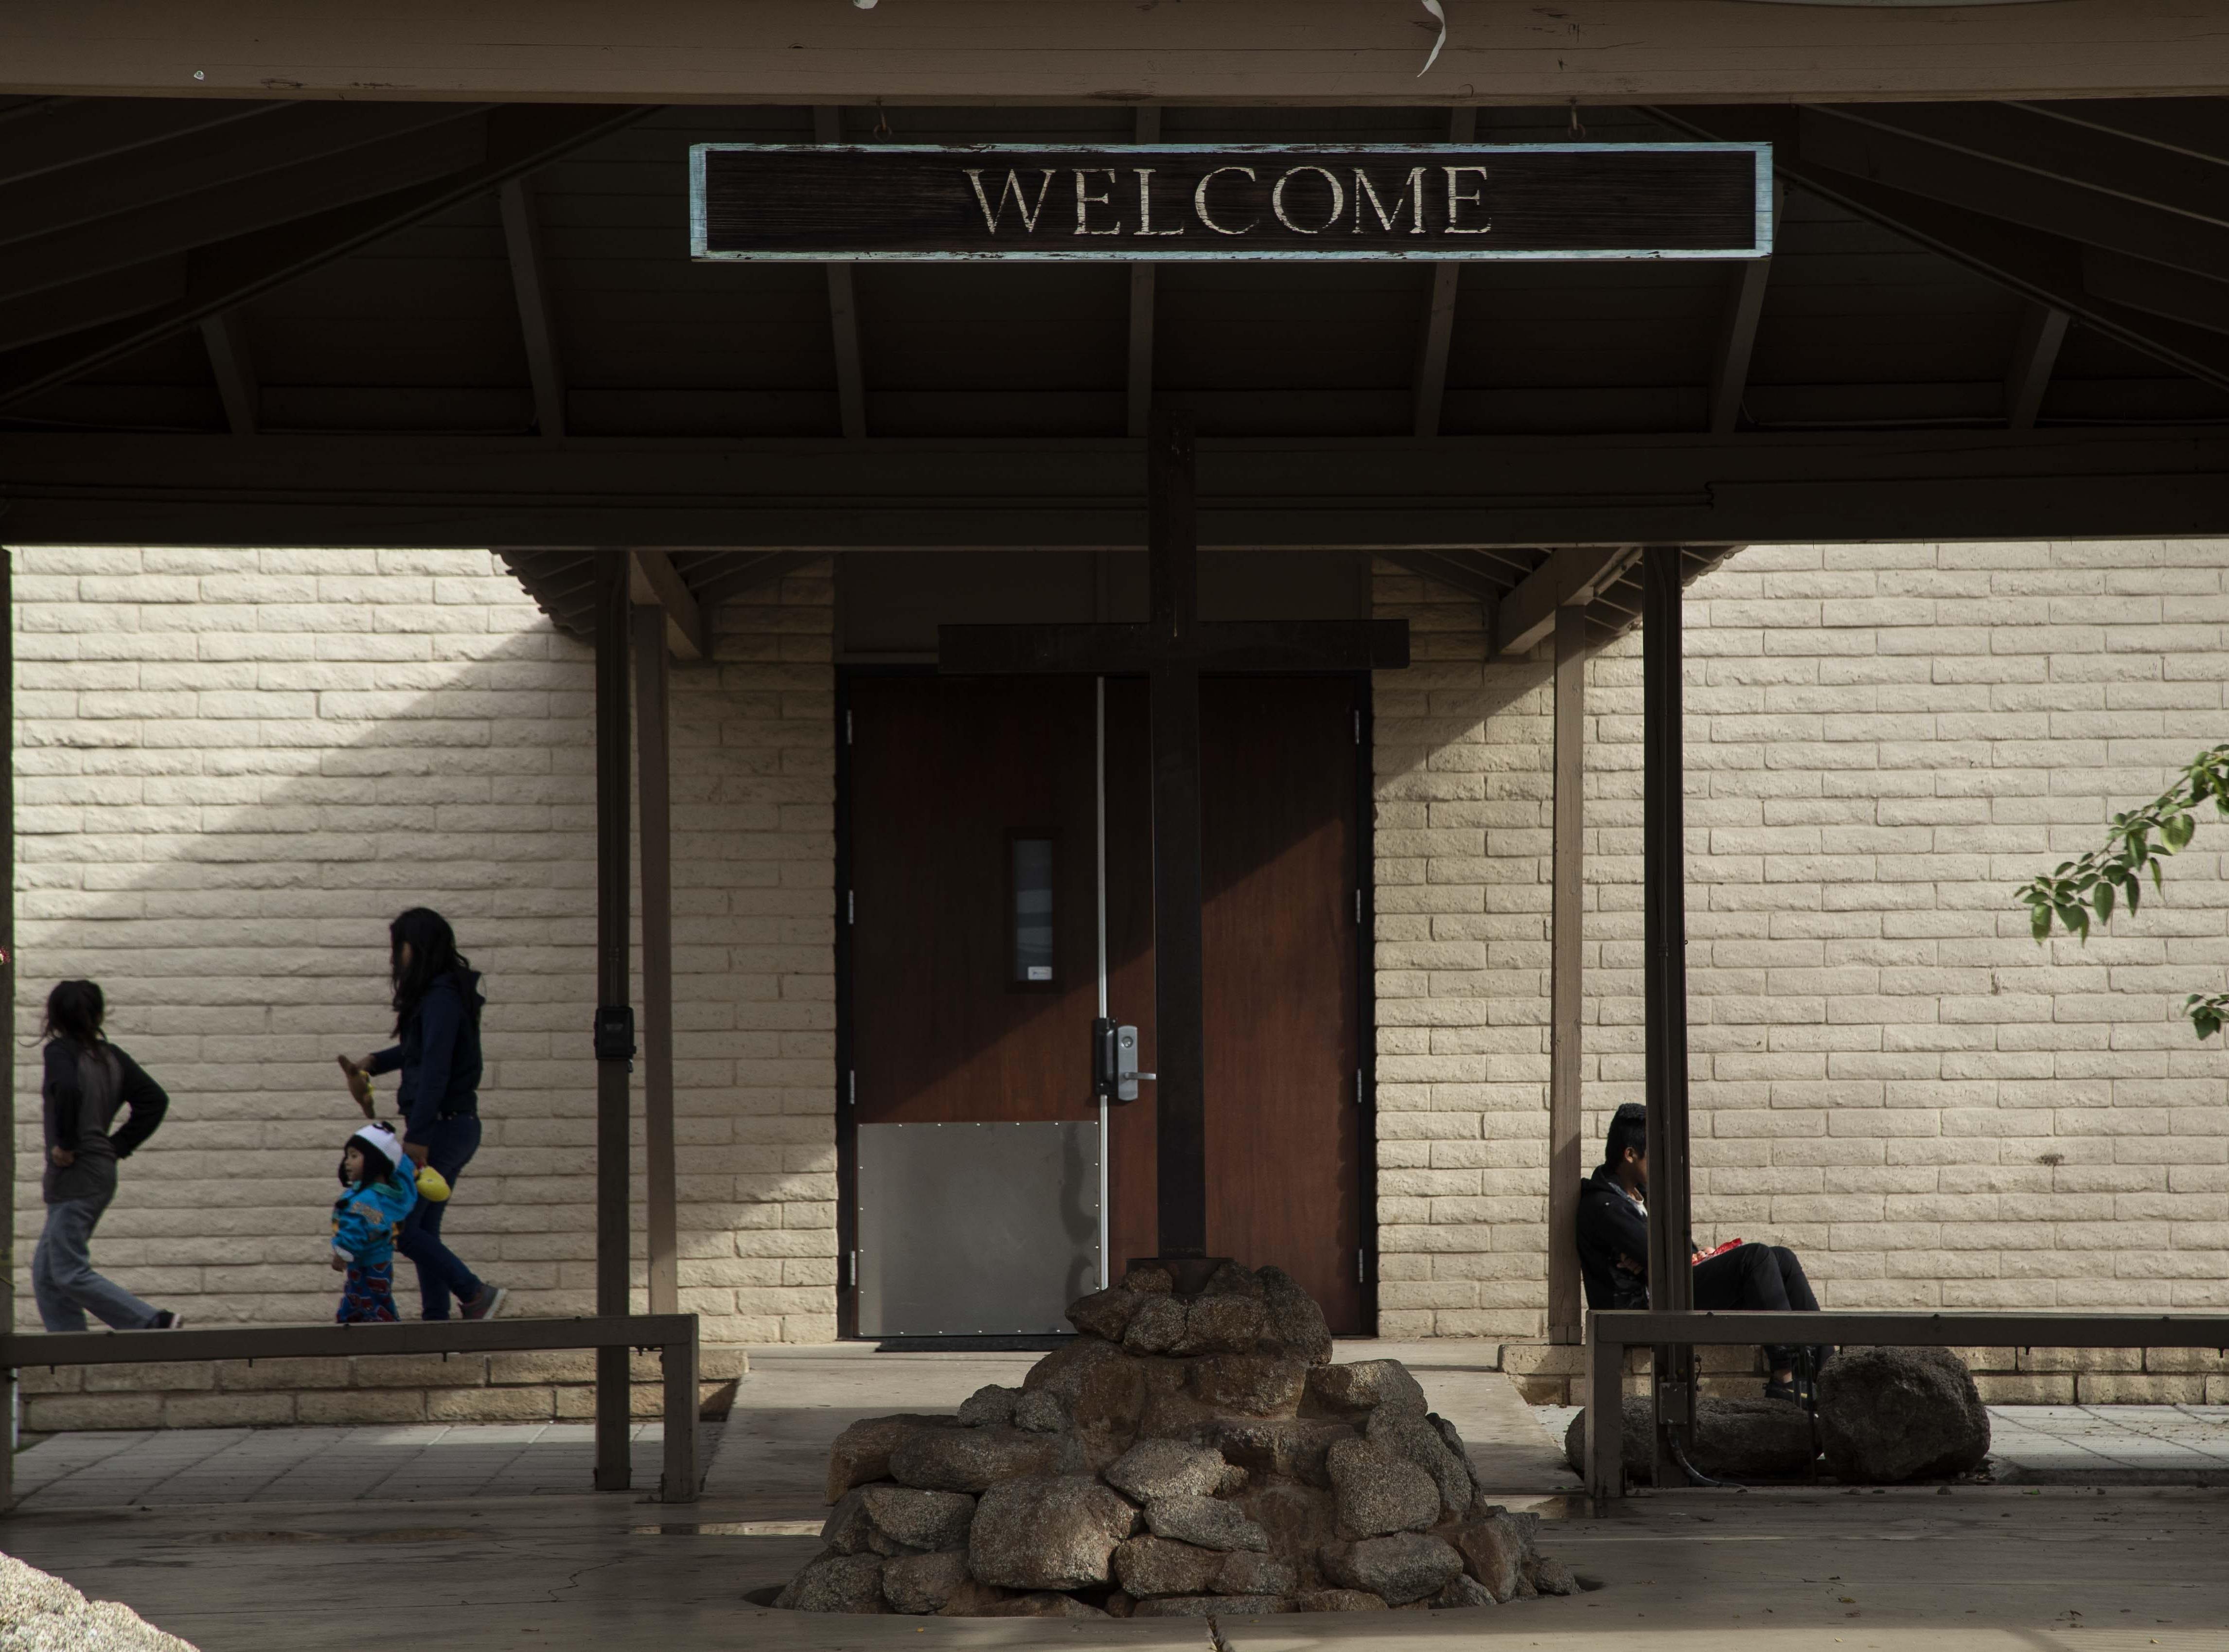 Migrant families at Casa de Oracion Number 2 in north Phoenix.